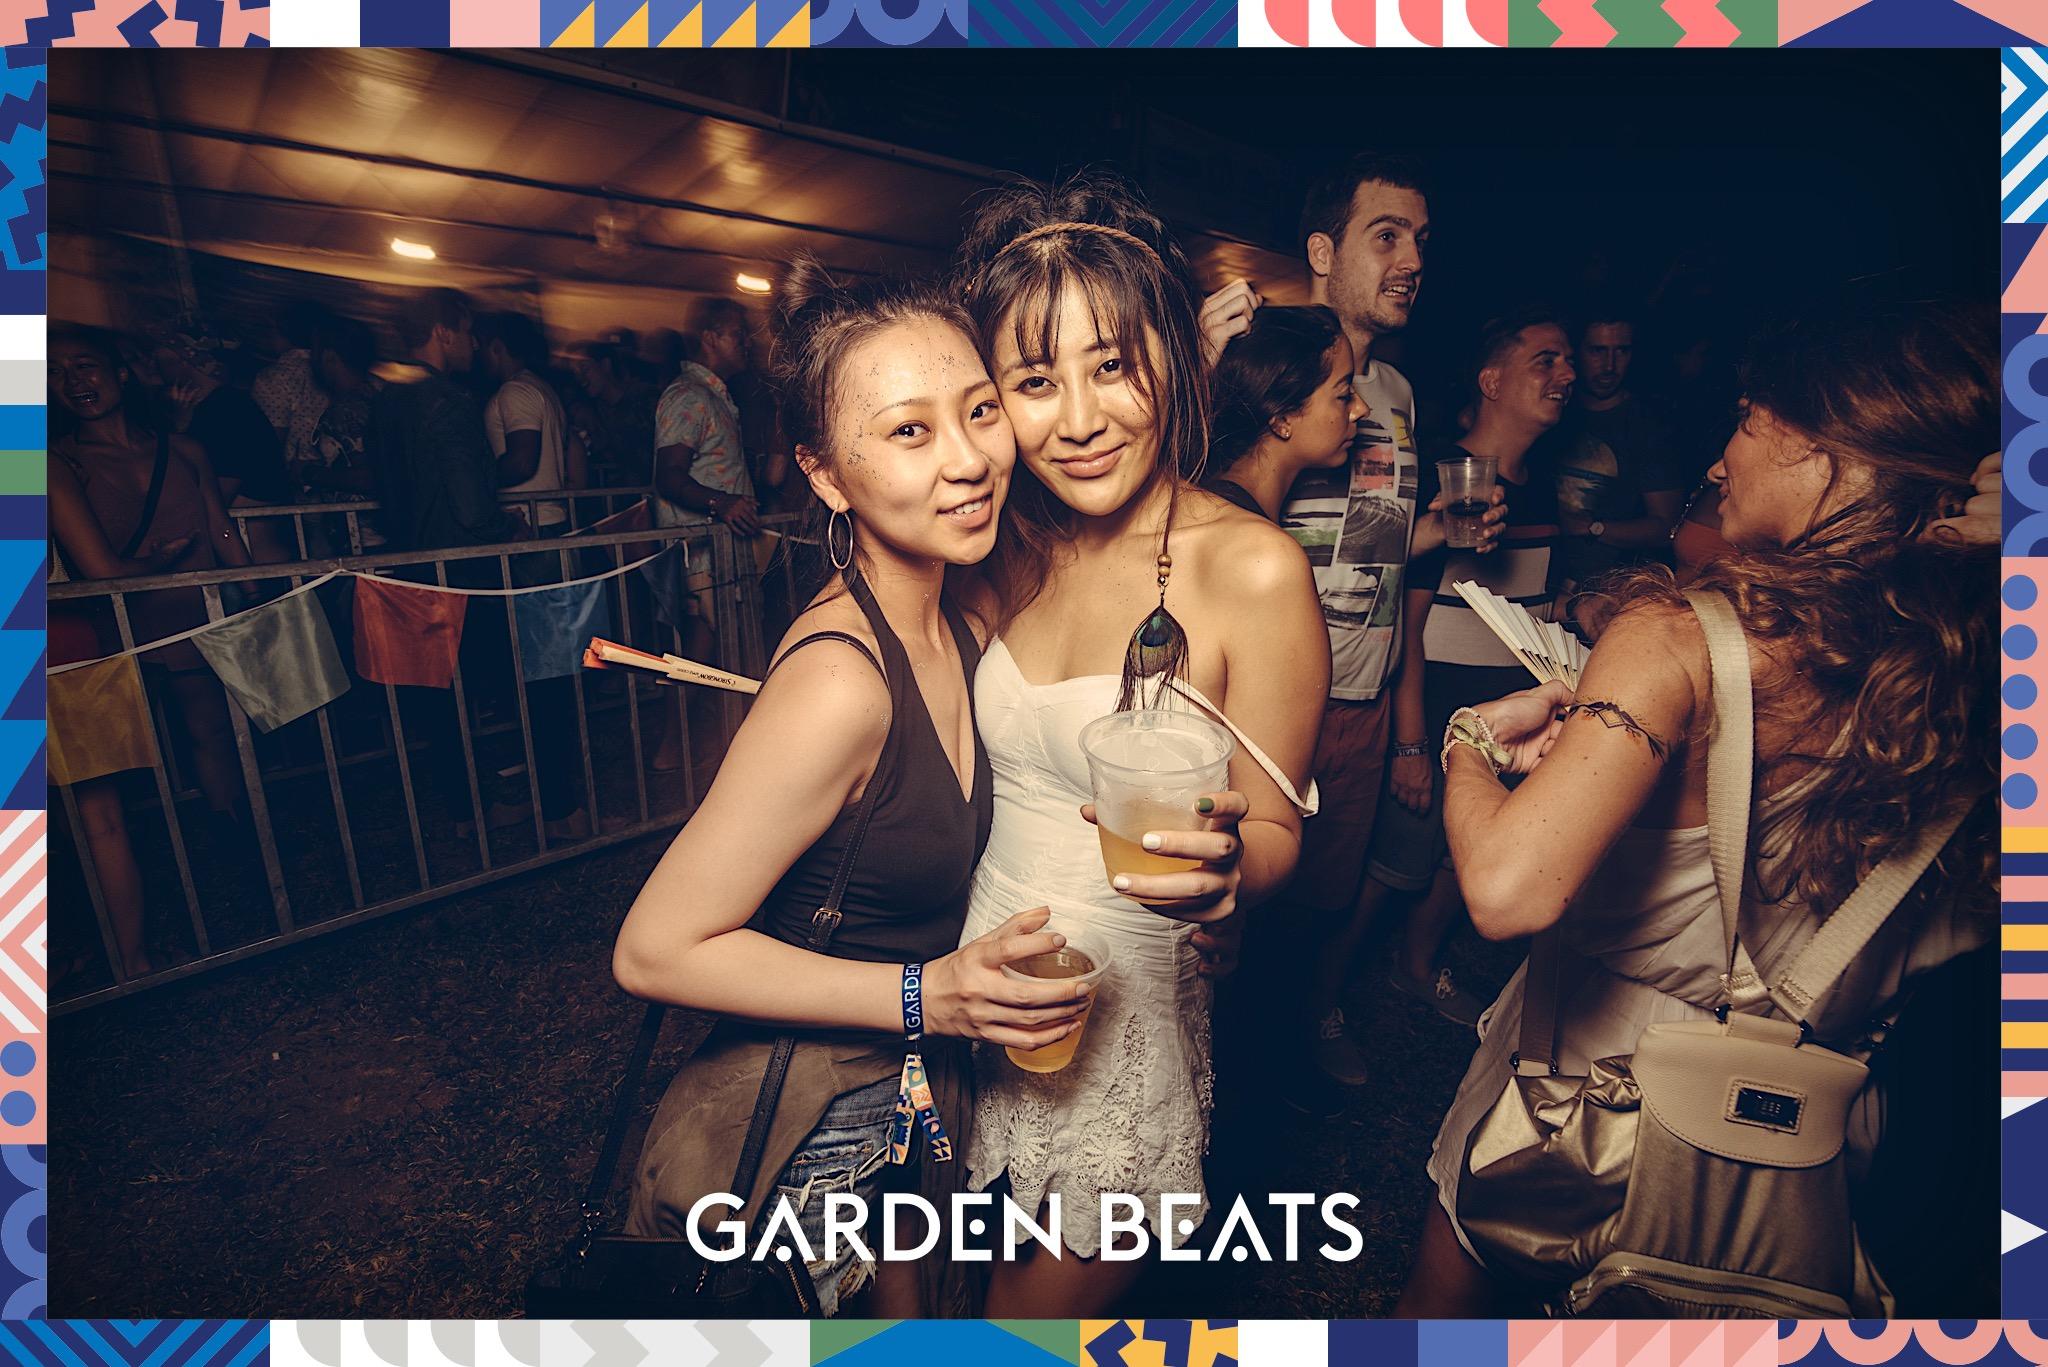 18032017_GardenBeats_Colossal809_WatermarkedGB.jpg